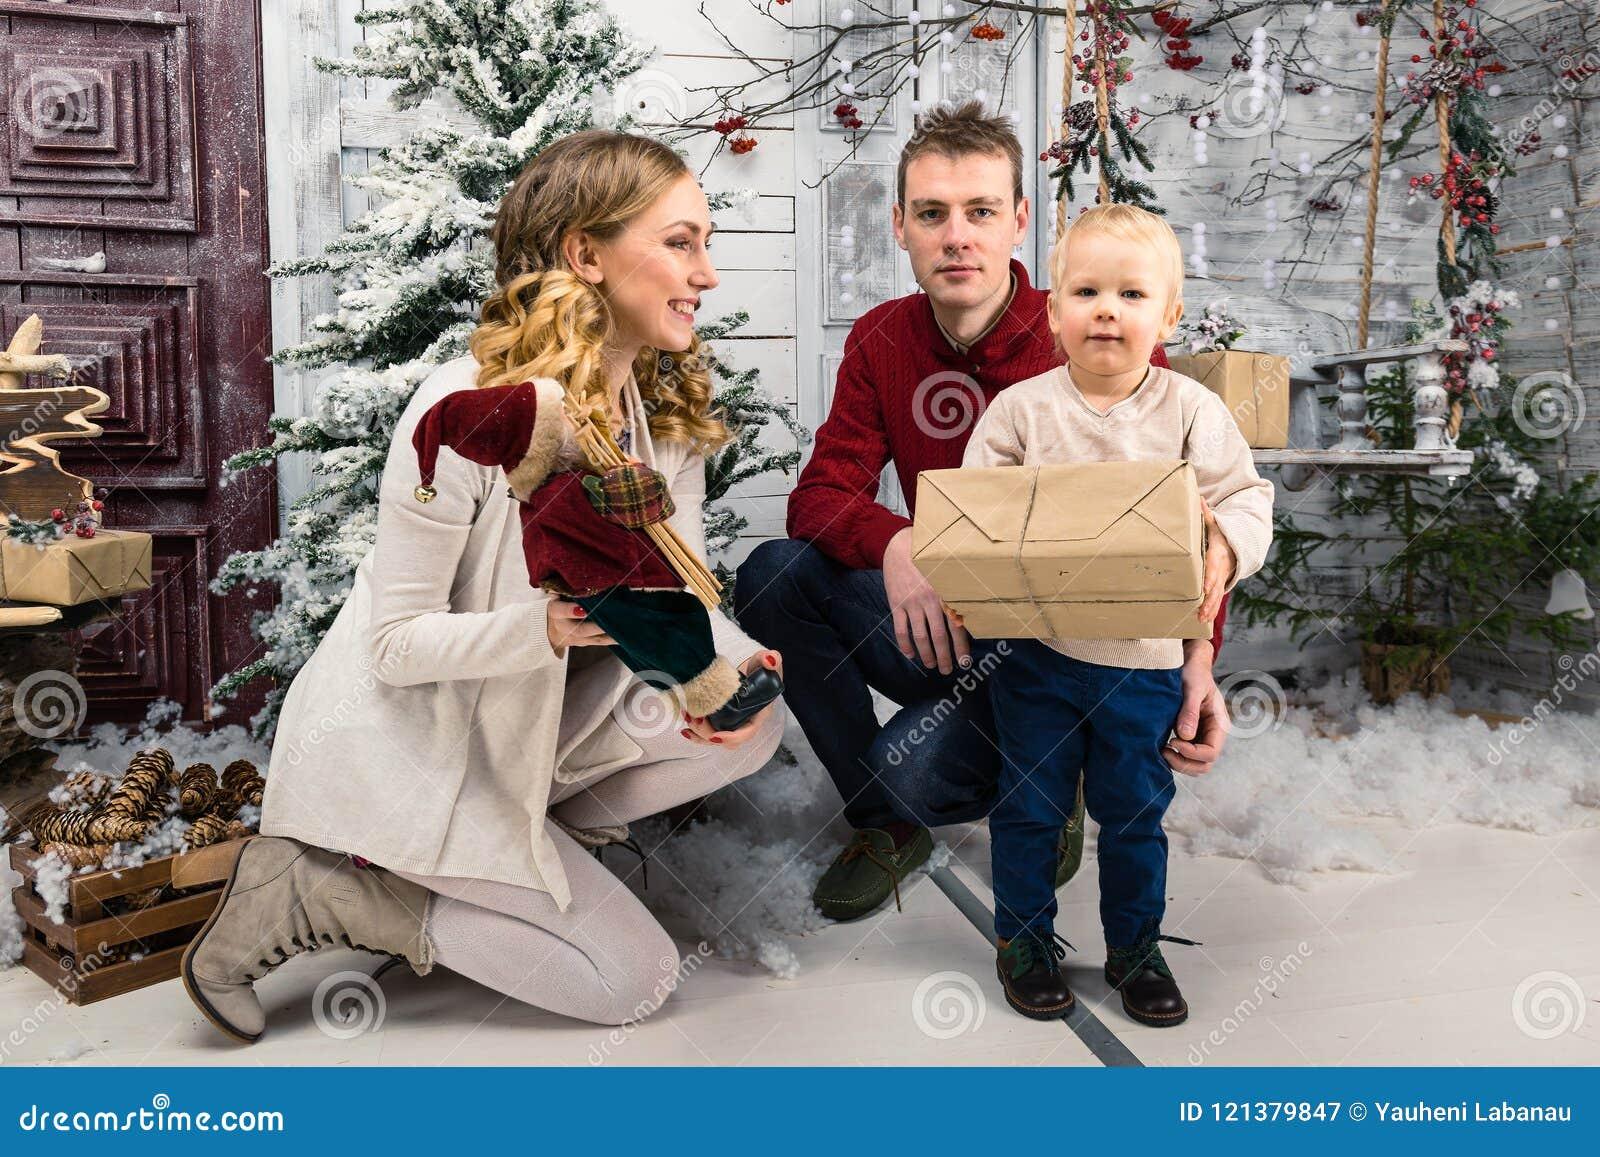 Surprising his son